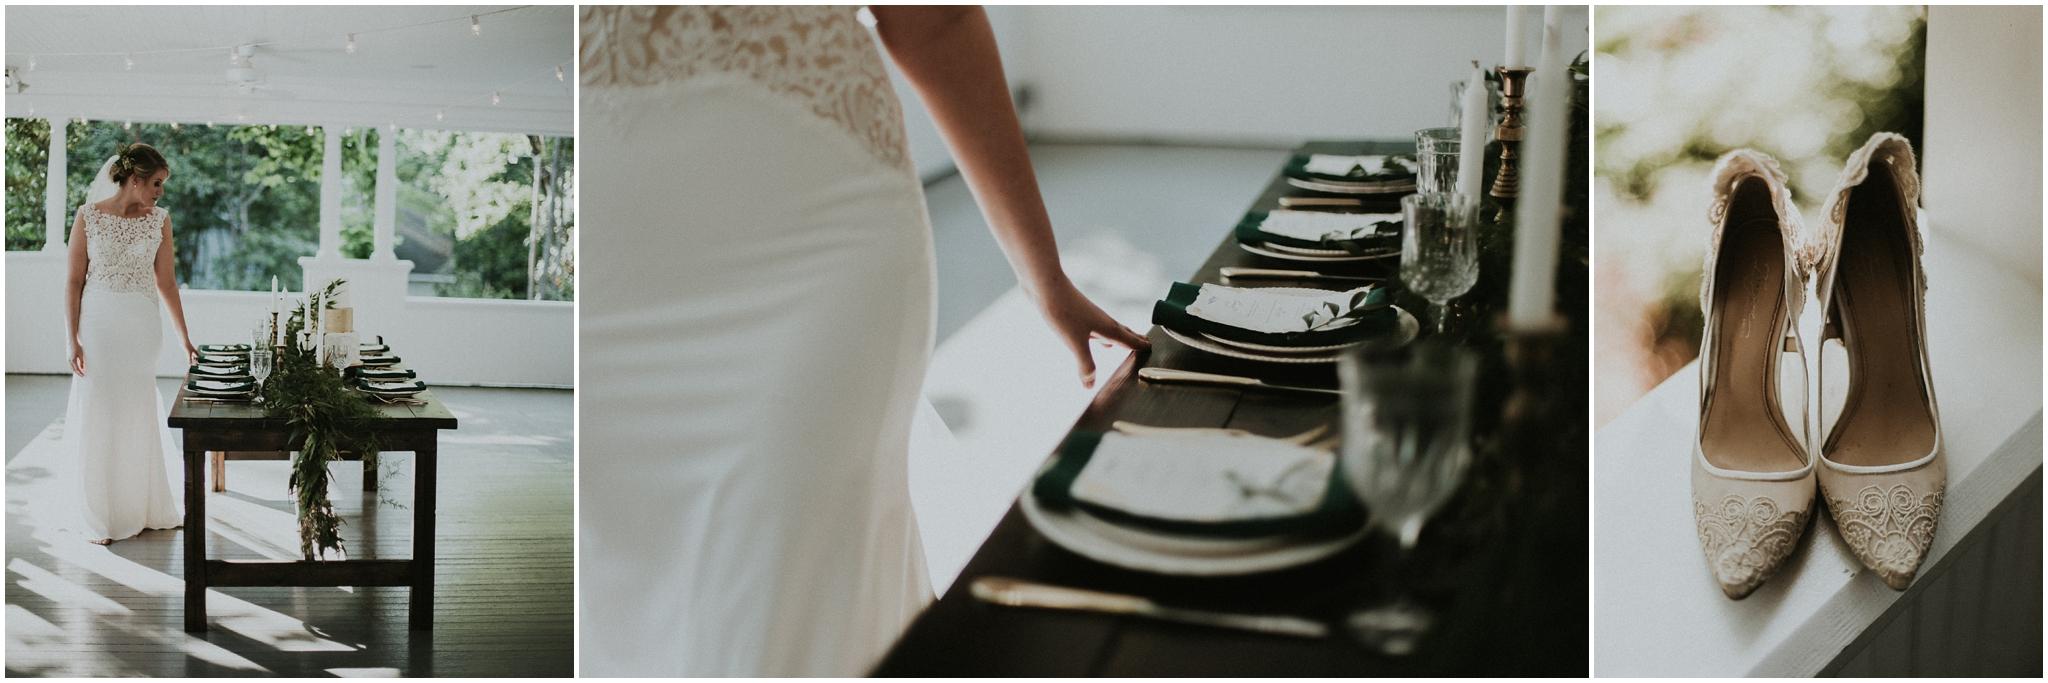 Wedding-photographer-ritchie-hill_0017.jpg